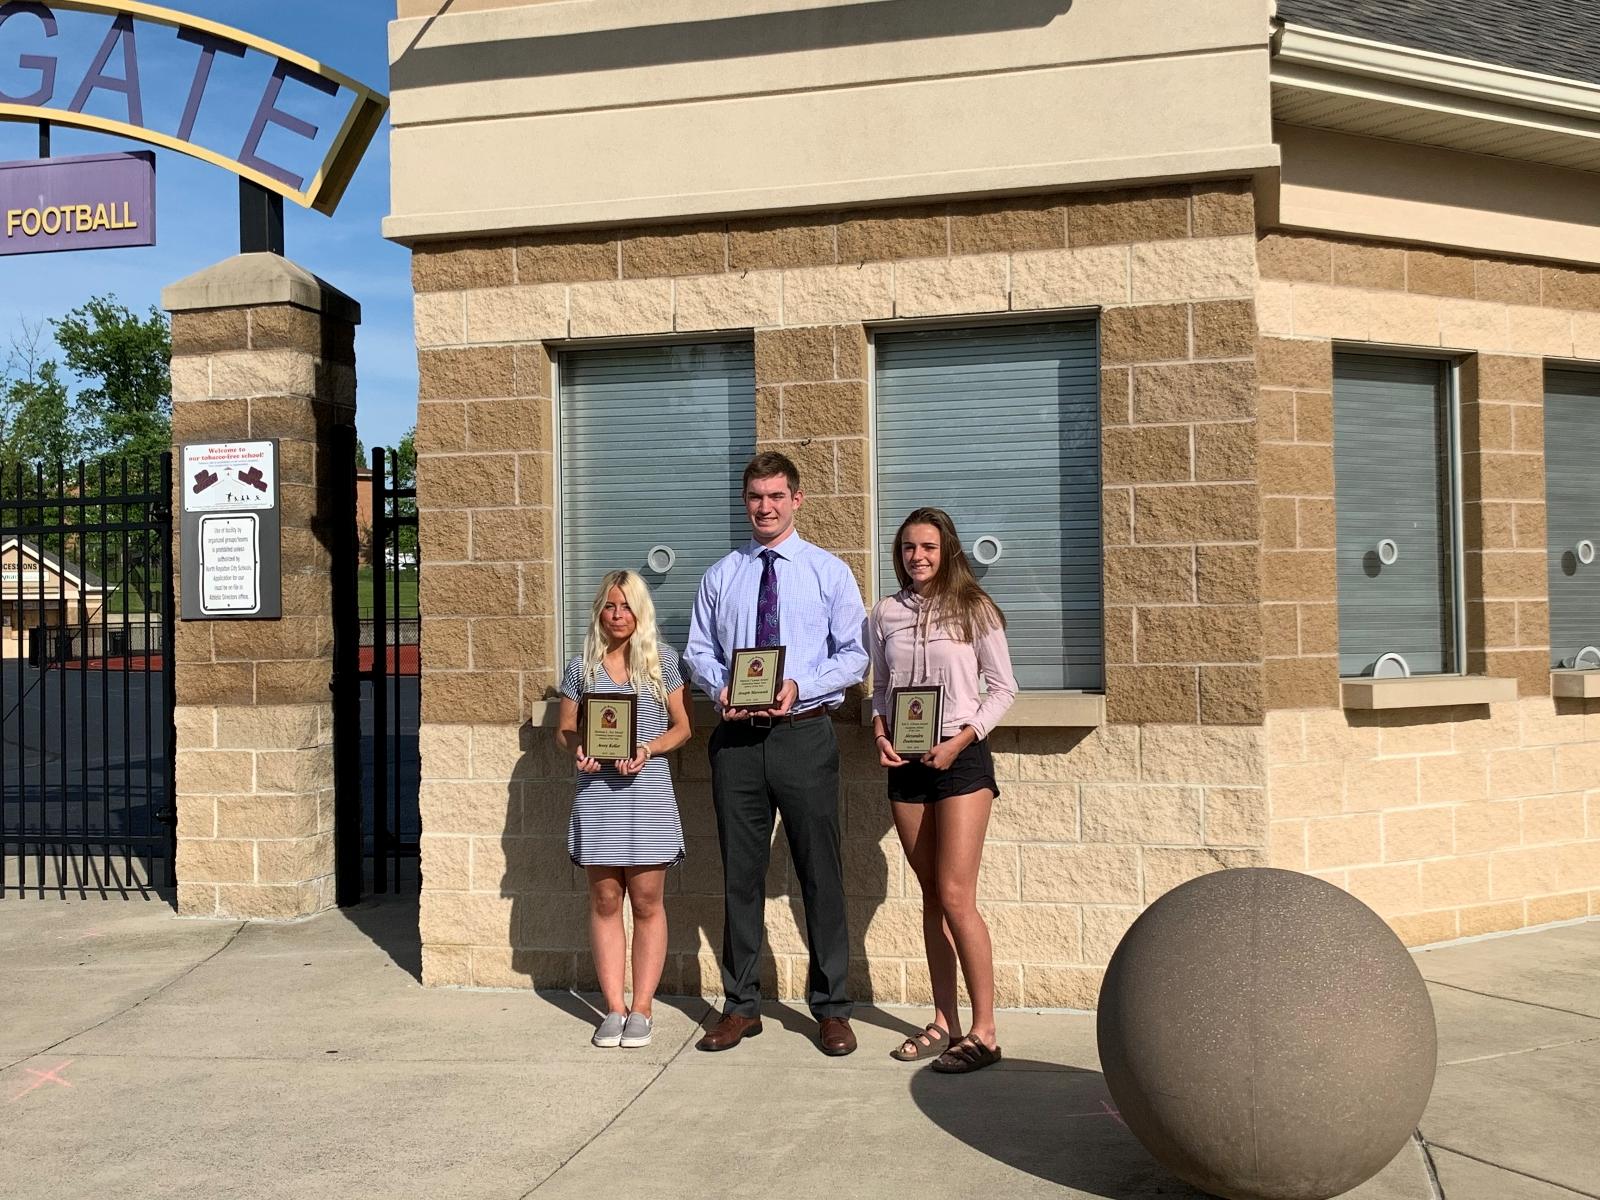 Royalton Recorder:  Marousek, Keller and Doehrmann Named North Royalton Athletes of the Year